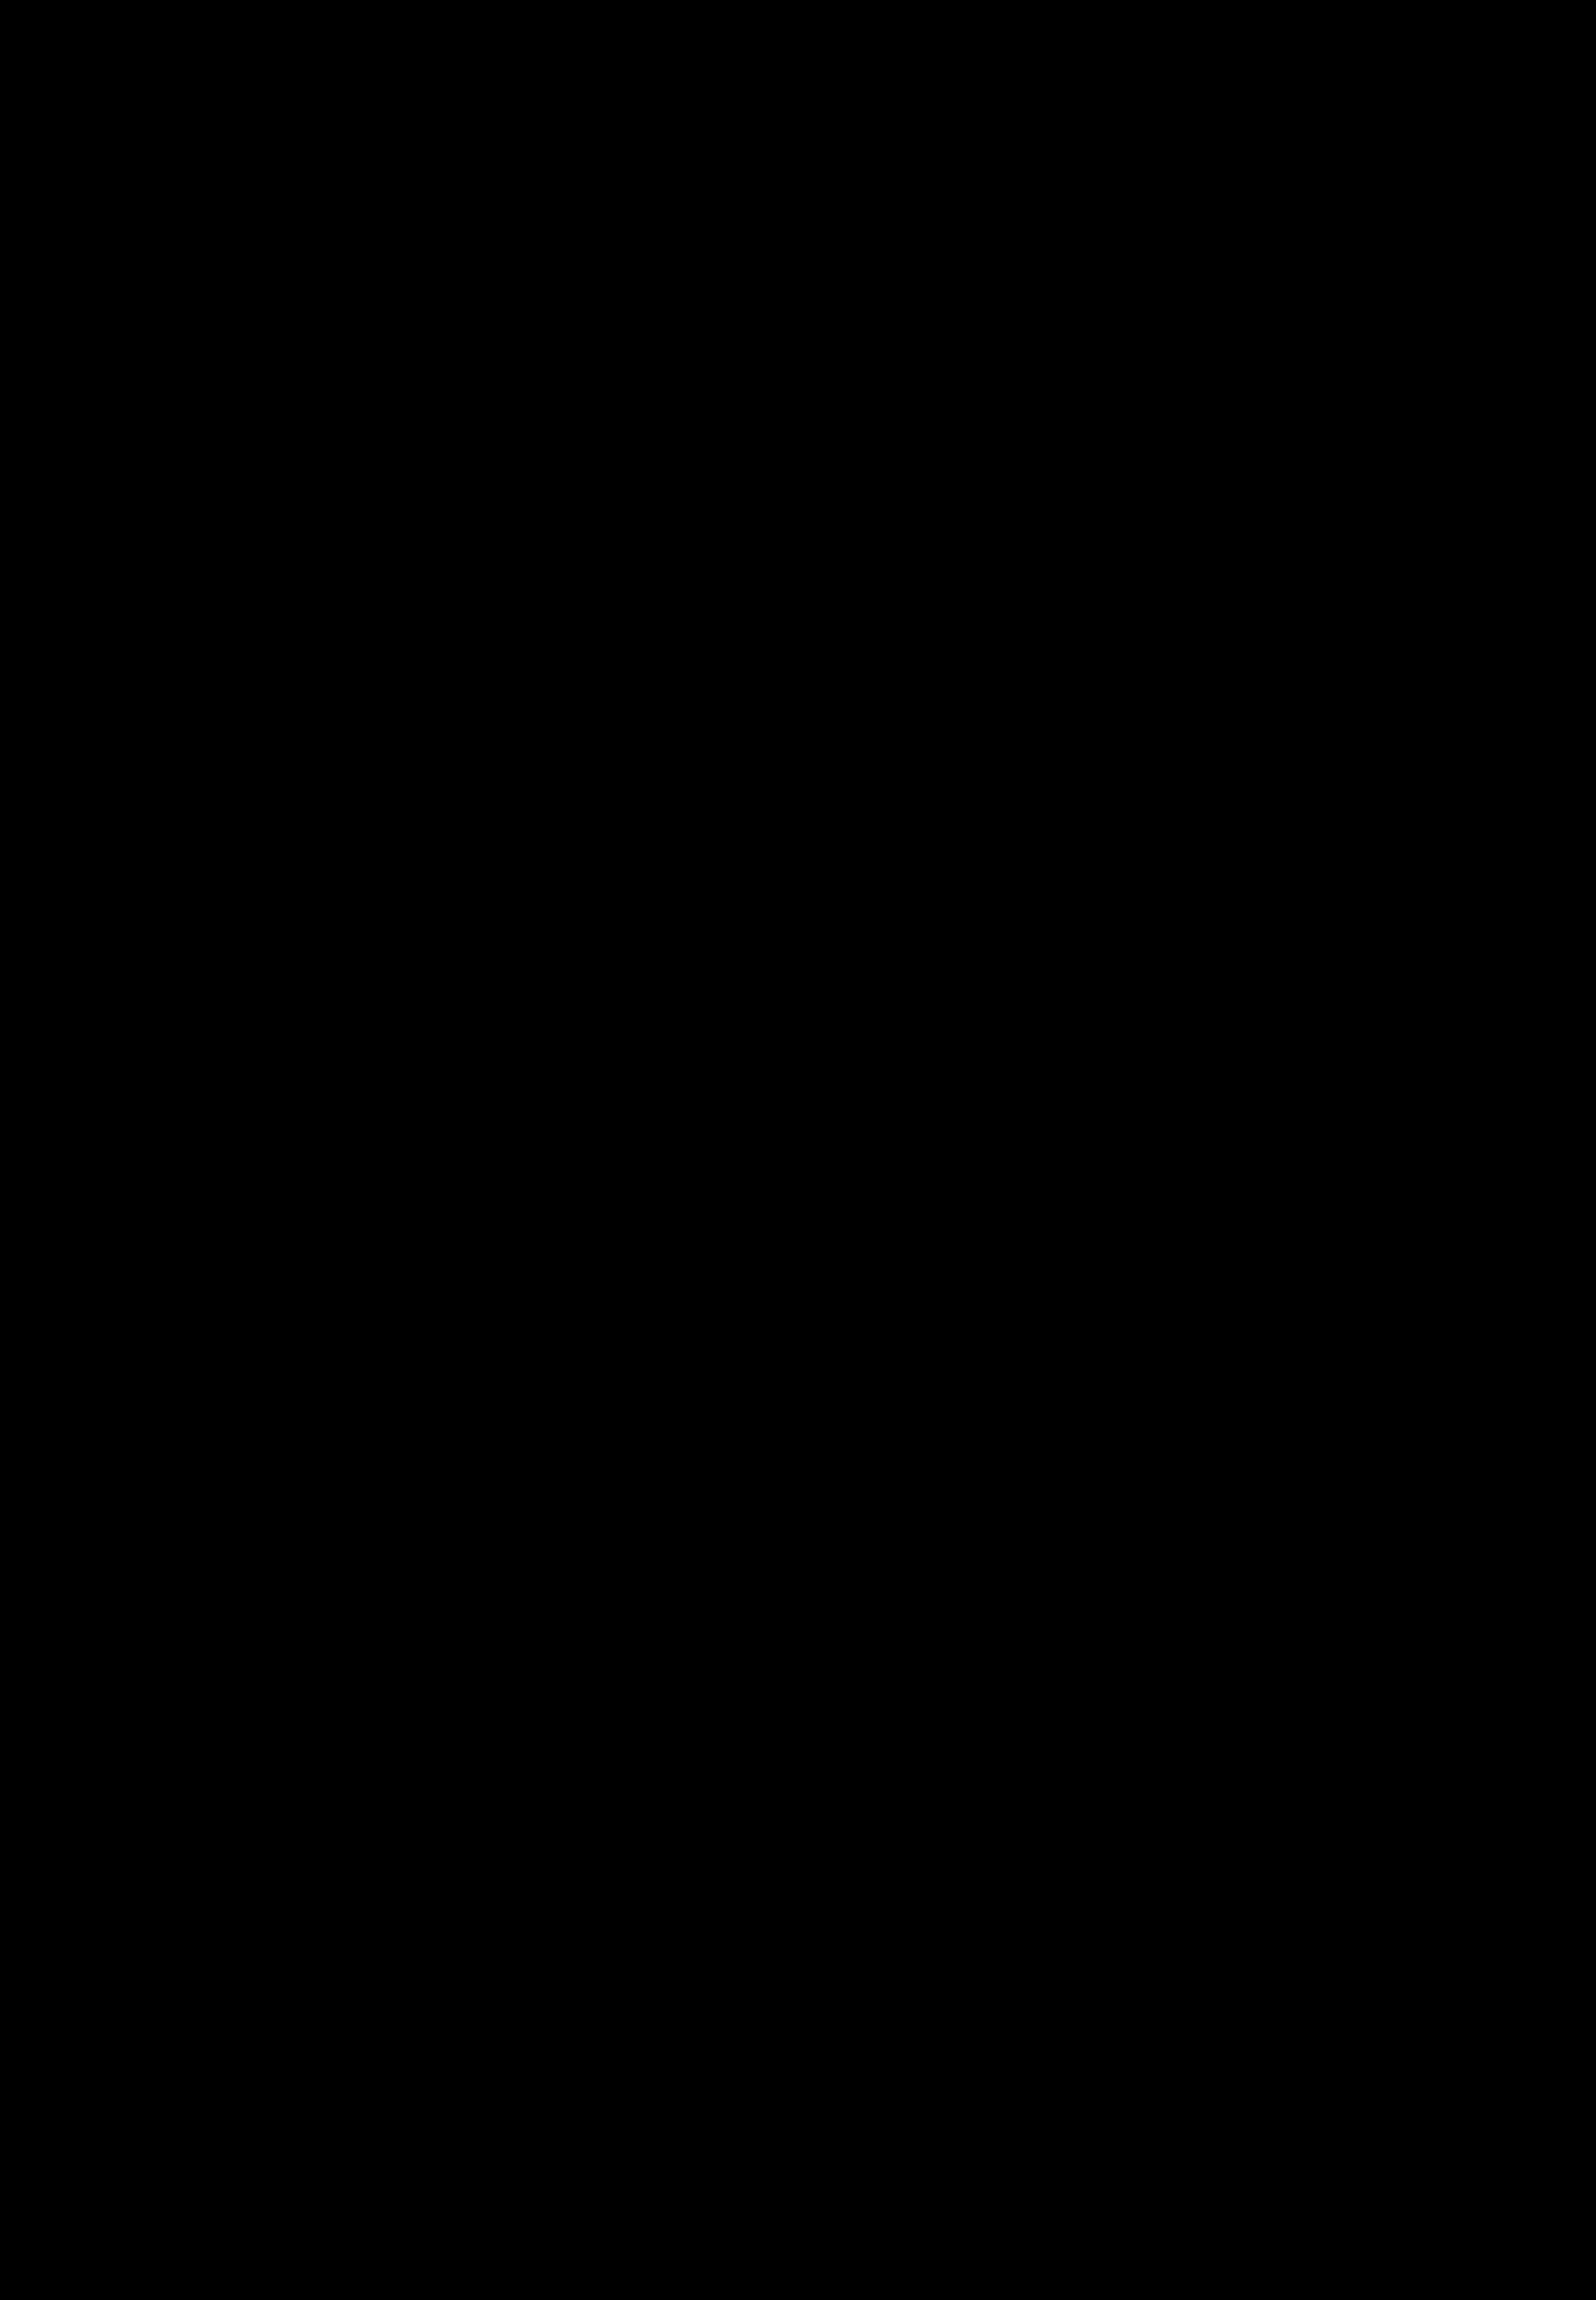 Border PNG File SVG Clip arts